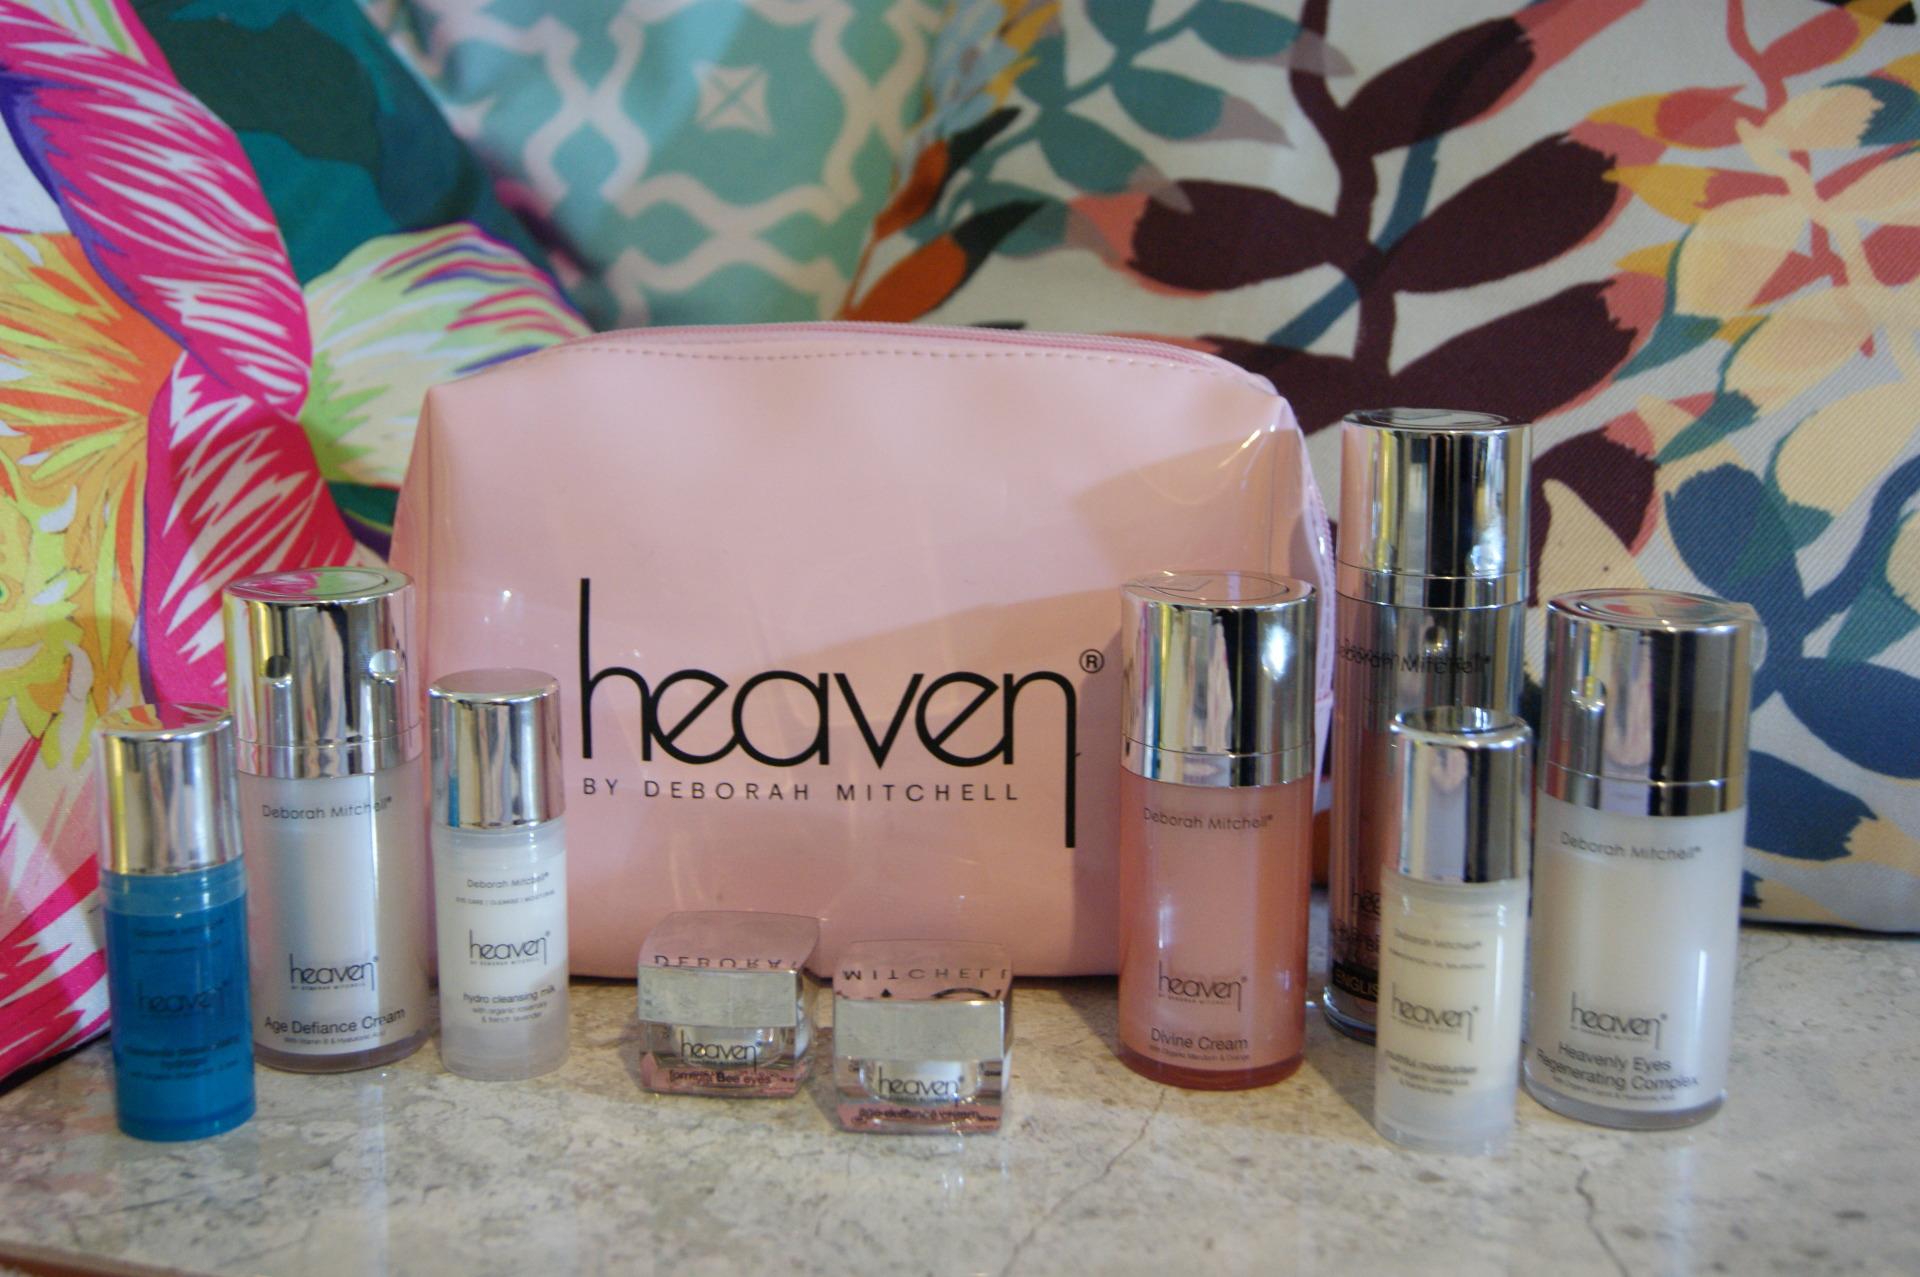 Heaven Skincare - Gift Bag